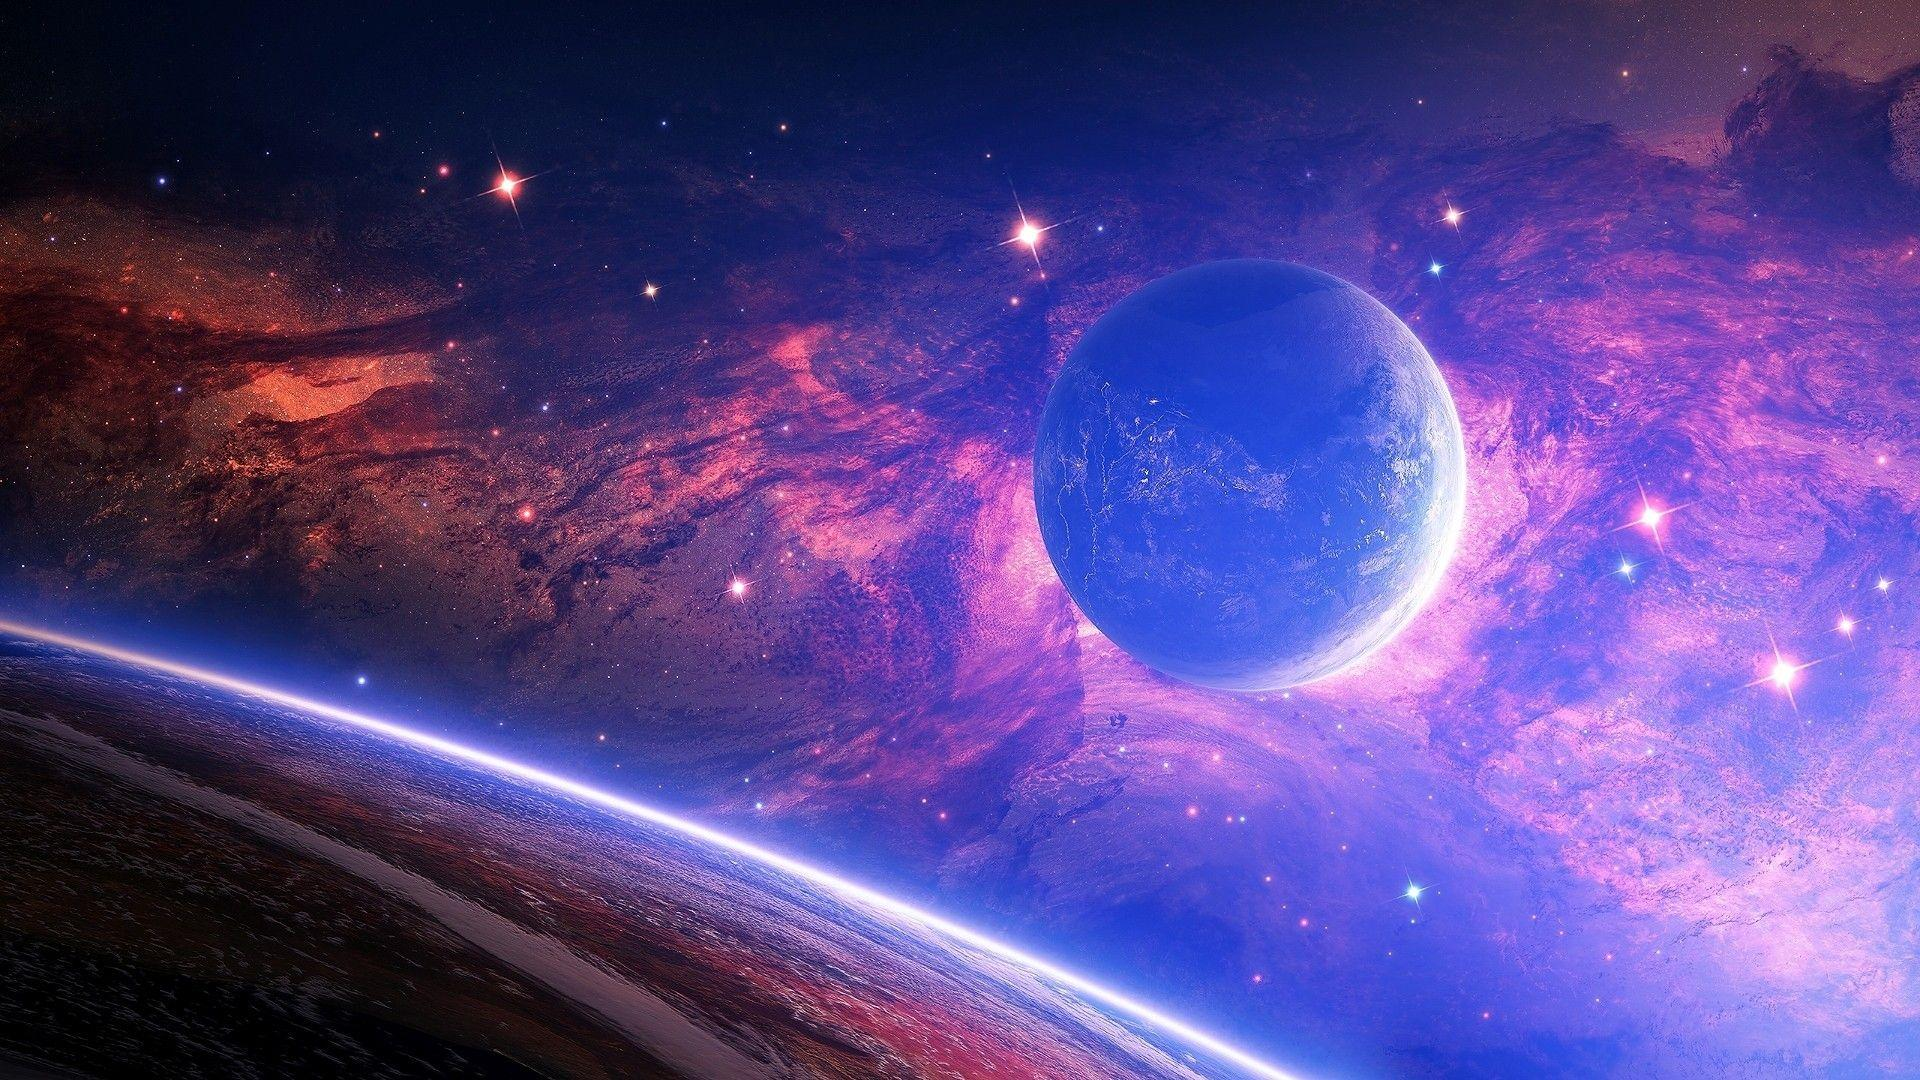 beautiful natural space image